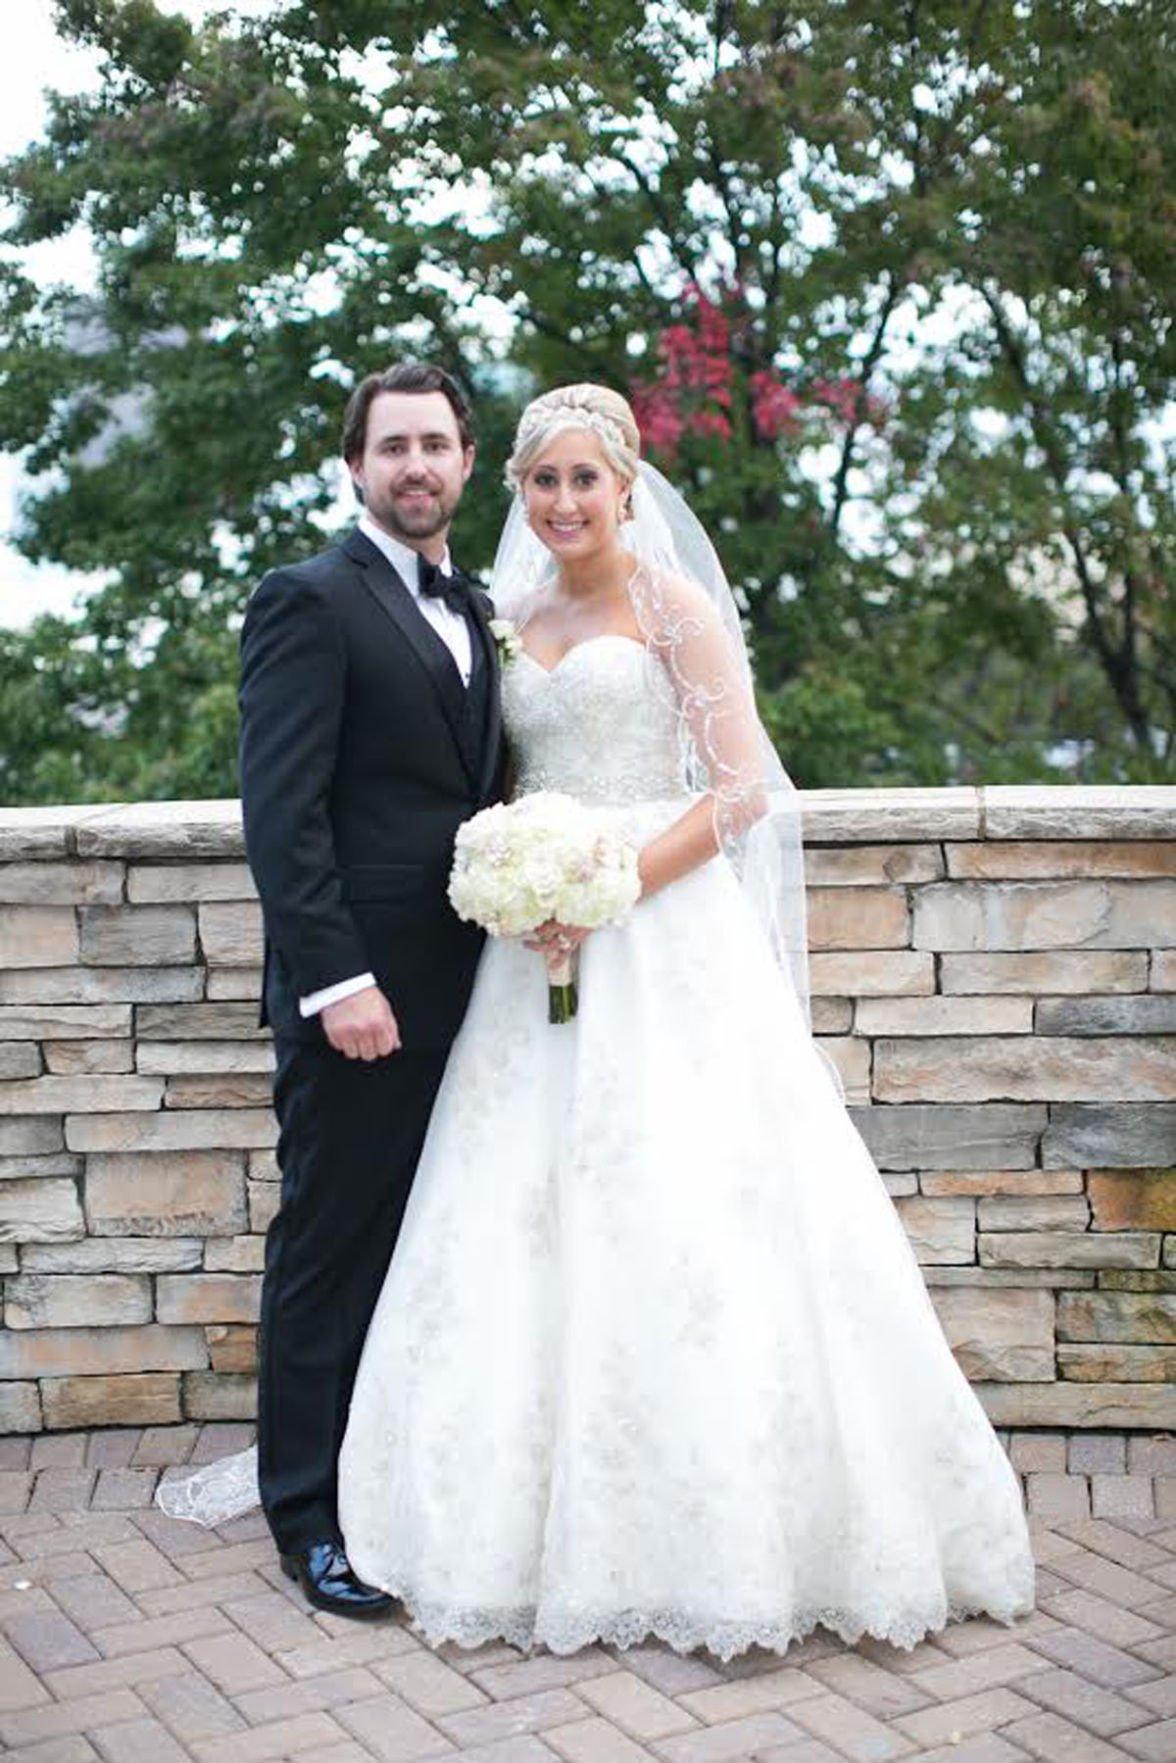 Mr. and Mrs. John Francis Hogan